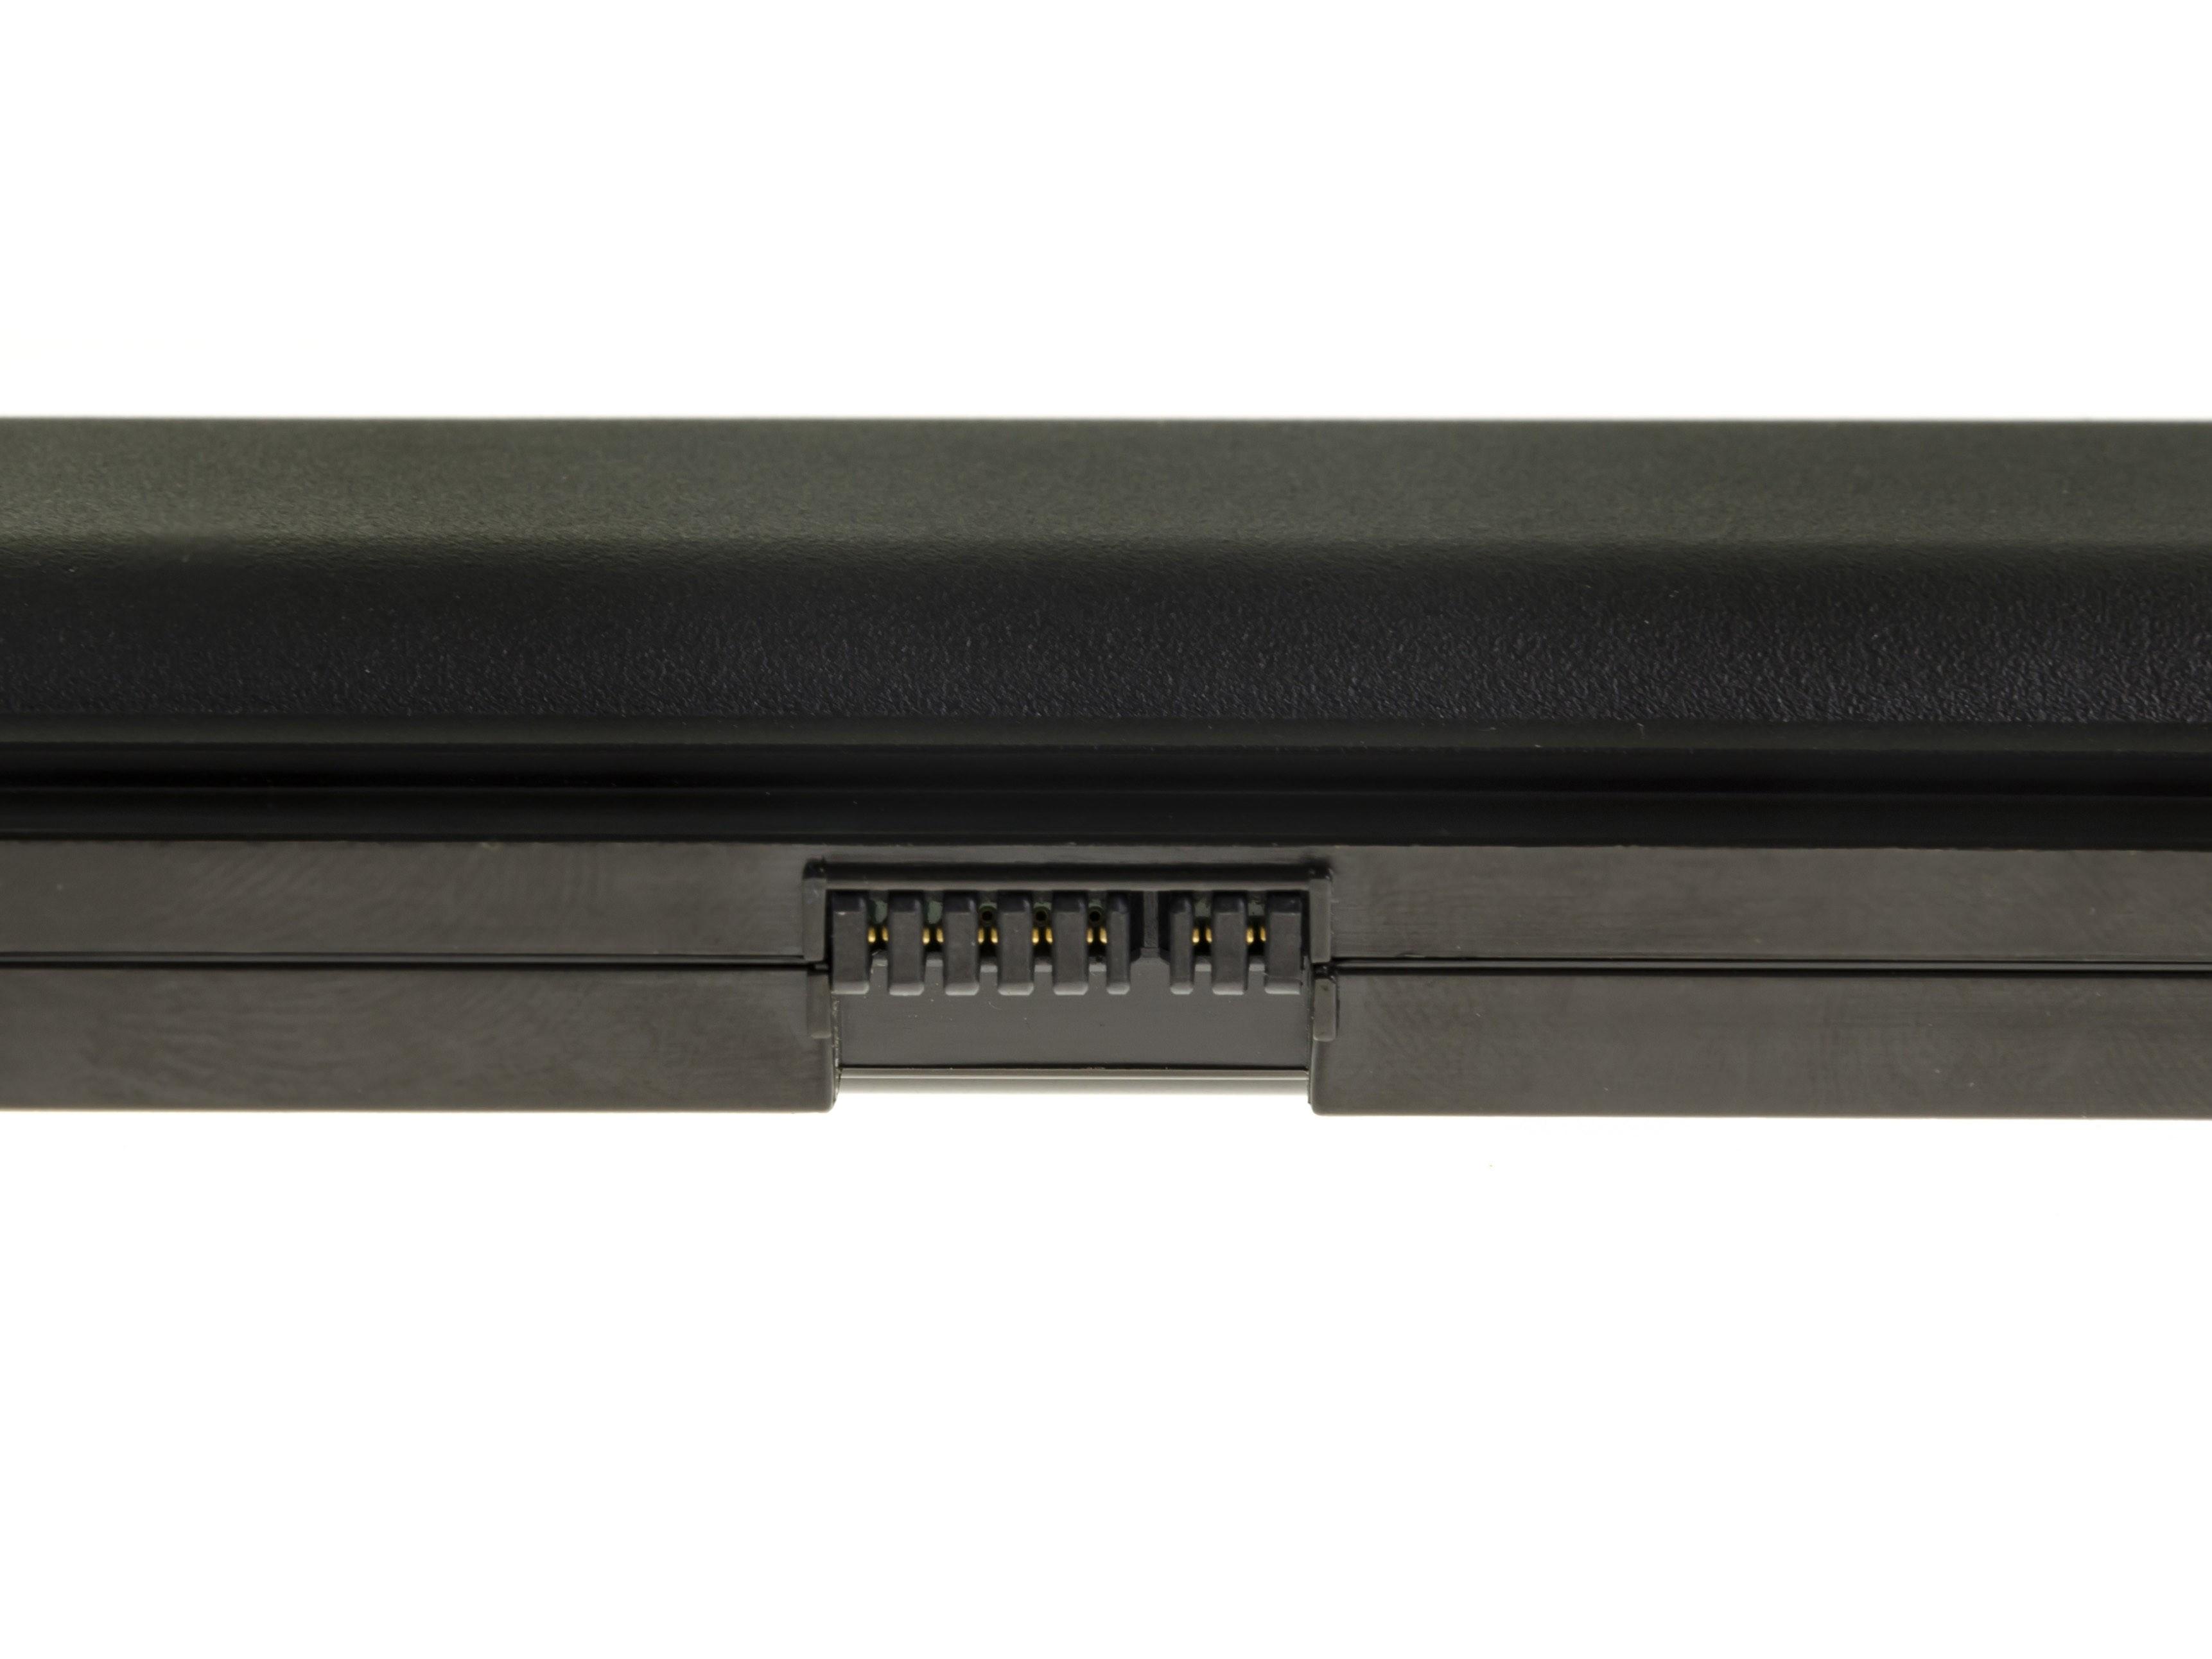 Green Cell LE80 Baterie Lenovo ThinkPad Edge E550 E550c E555 E560 E565 4400mAh Li-ion - neoriginální